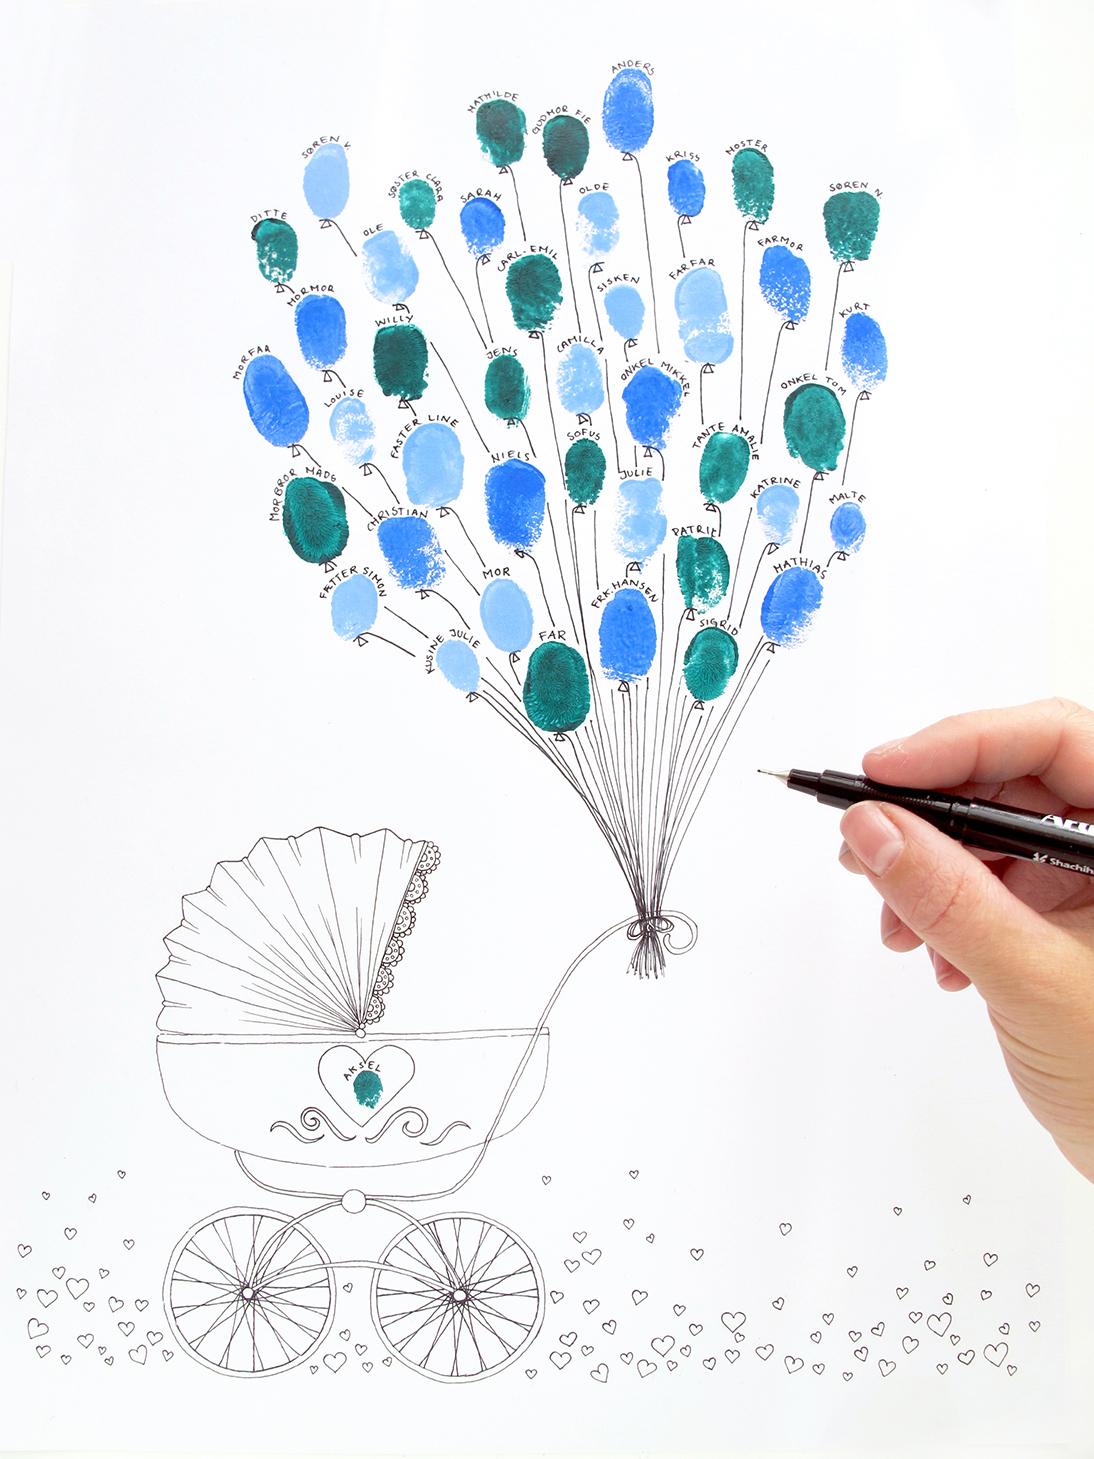 barnevogns illustration til fingeraftryk